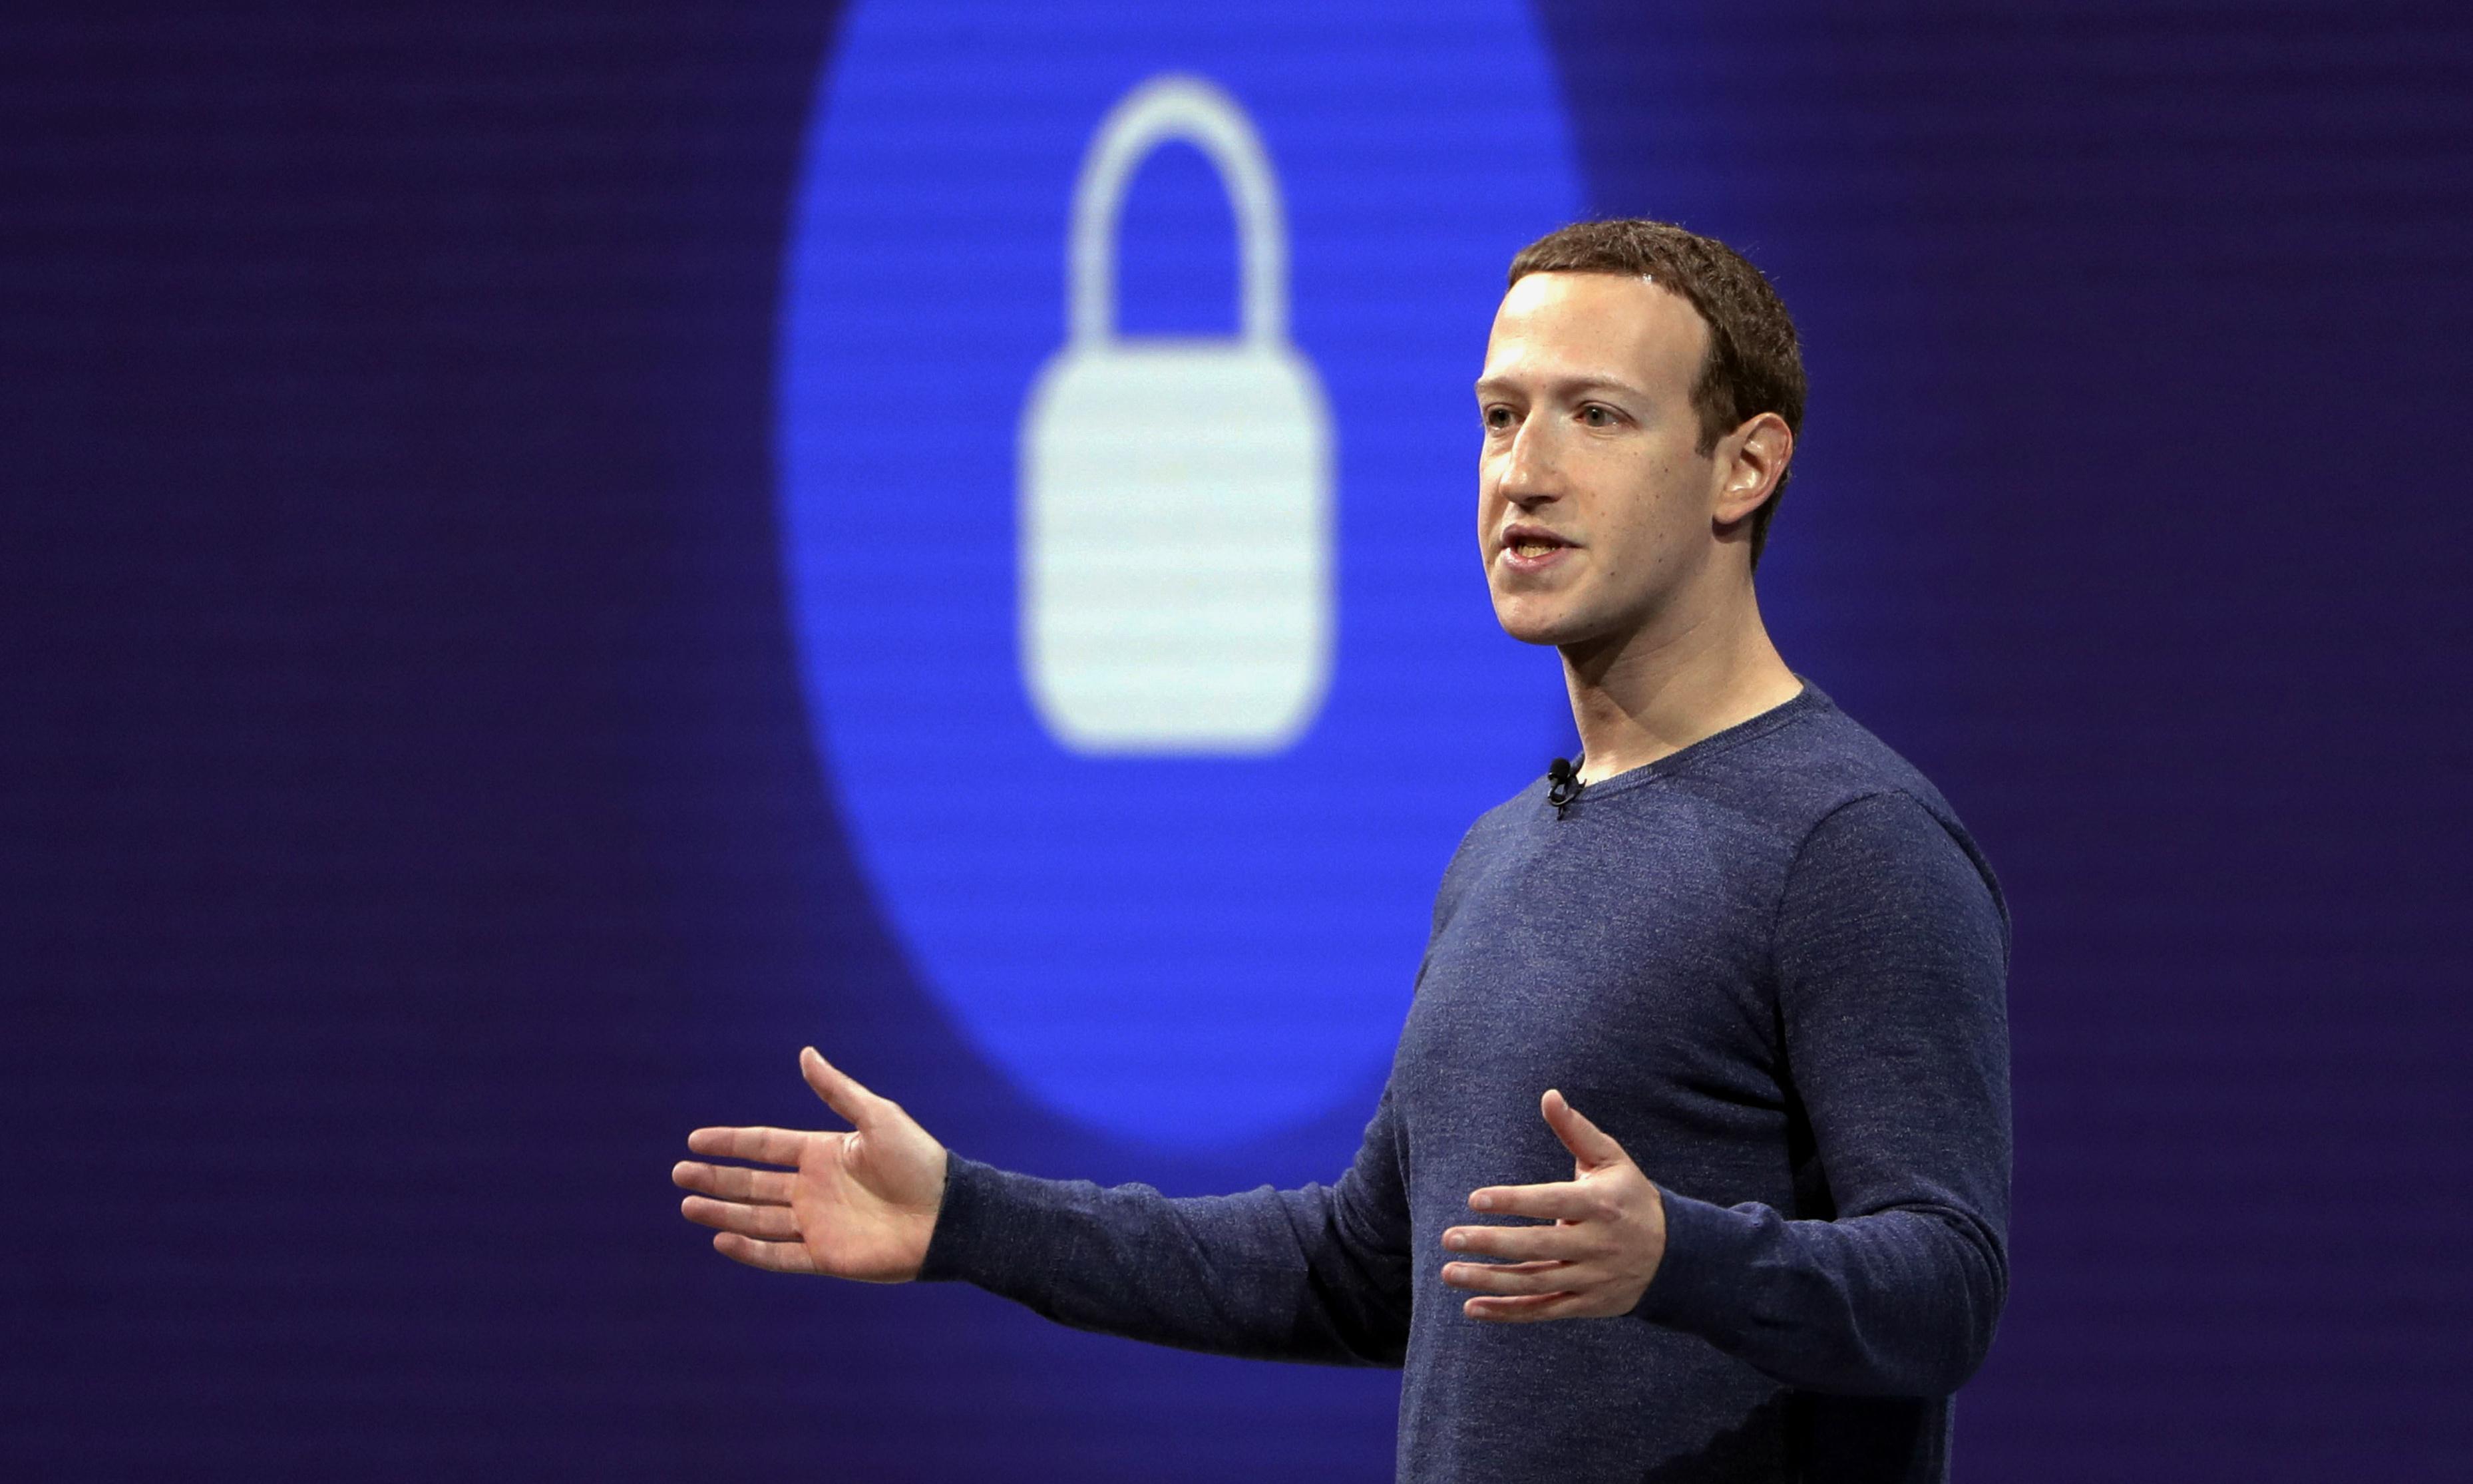 Does Mark Zuckerberg's summer reading betray his desire for world domination?